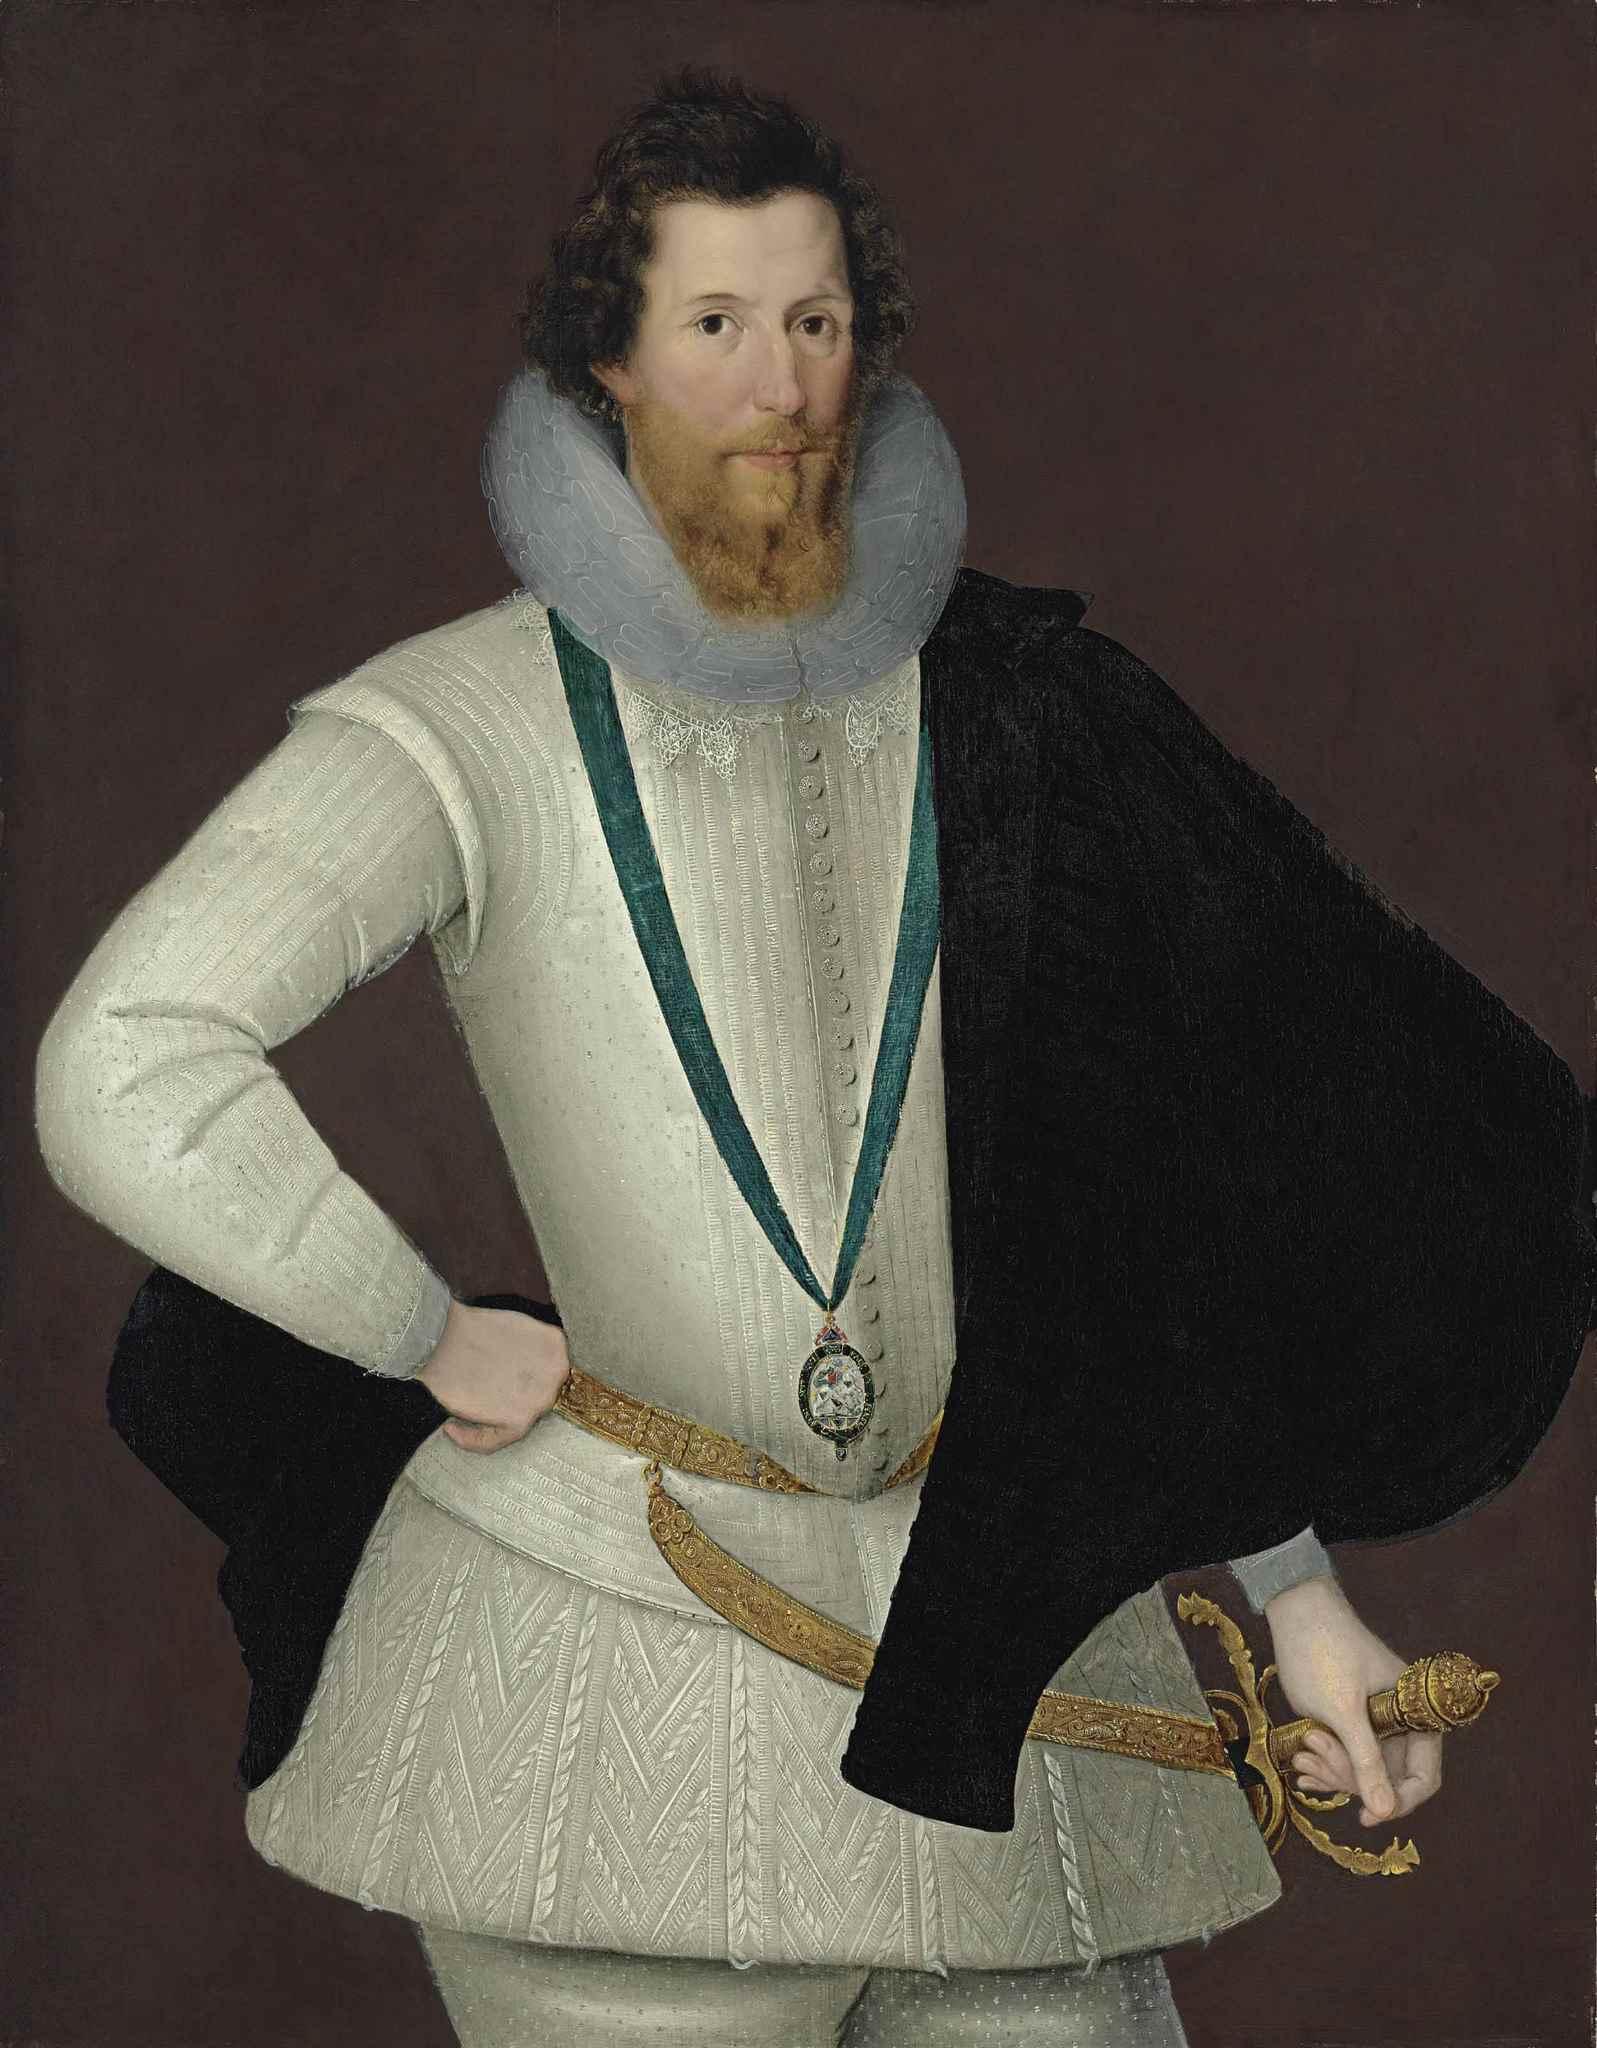 https://upload.wikimedia.org/wikipedia/commons/3/3f/Marcus_Gheeraerts_II_Robert_Devereux_2nd_Earl_of_Essex.jpg